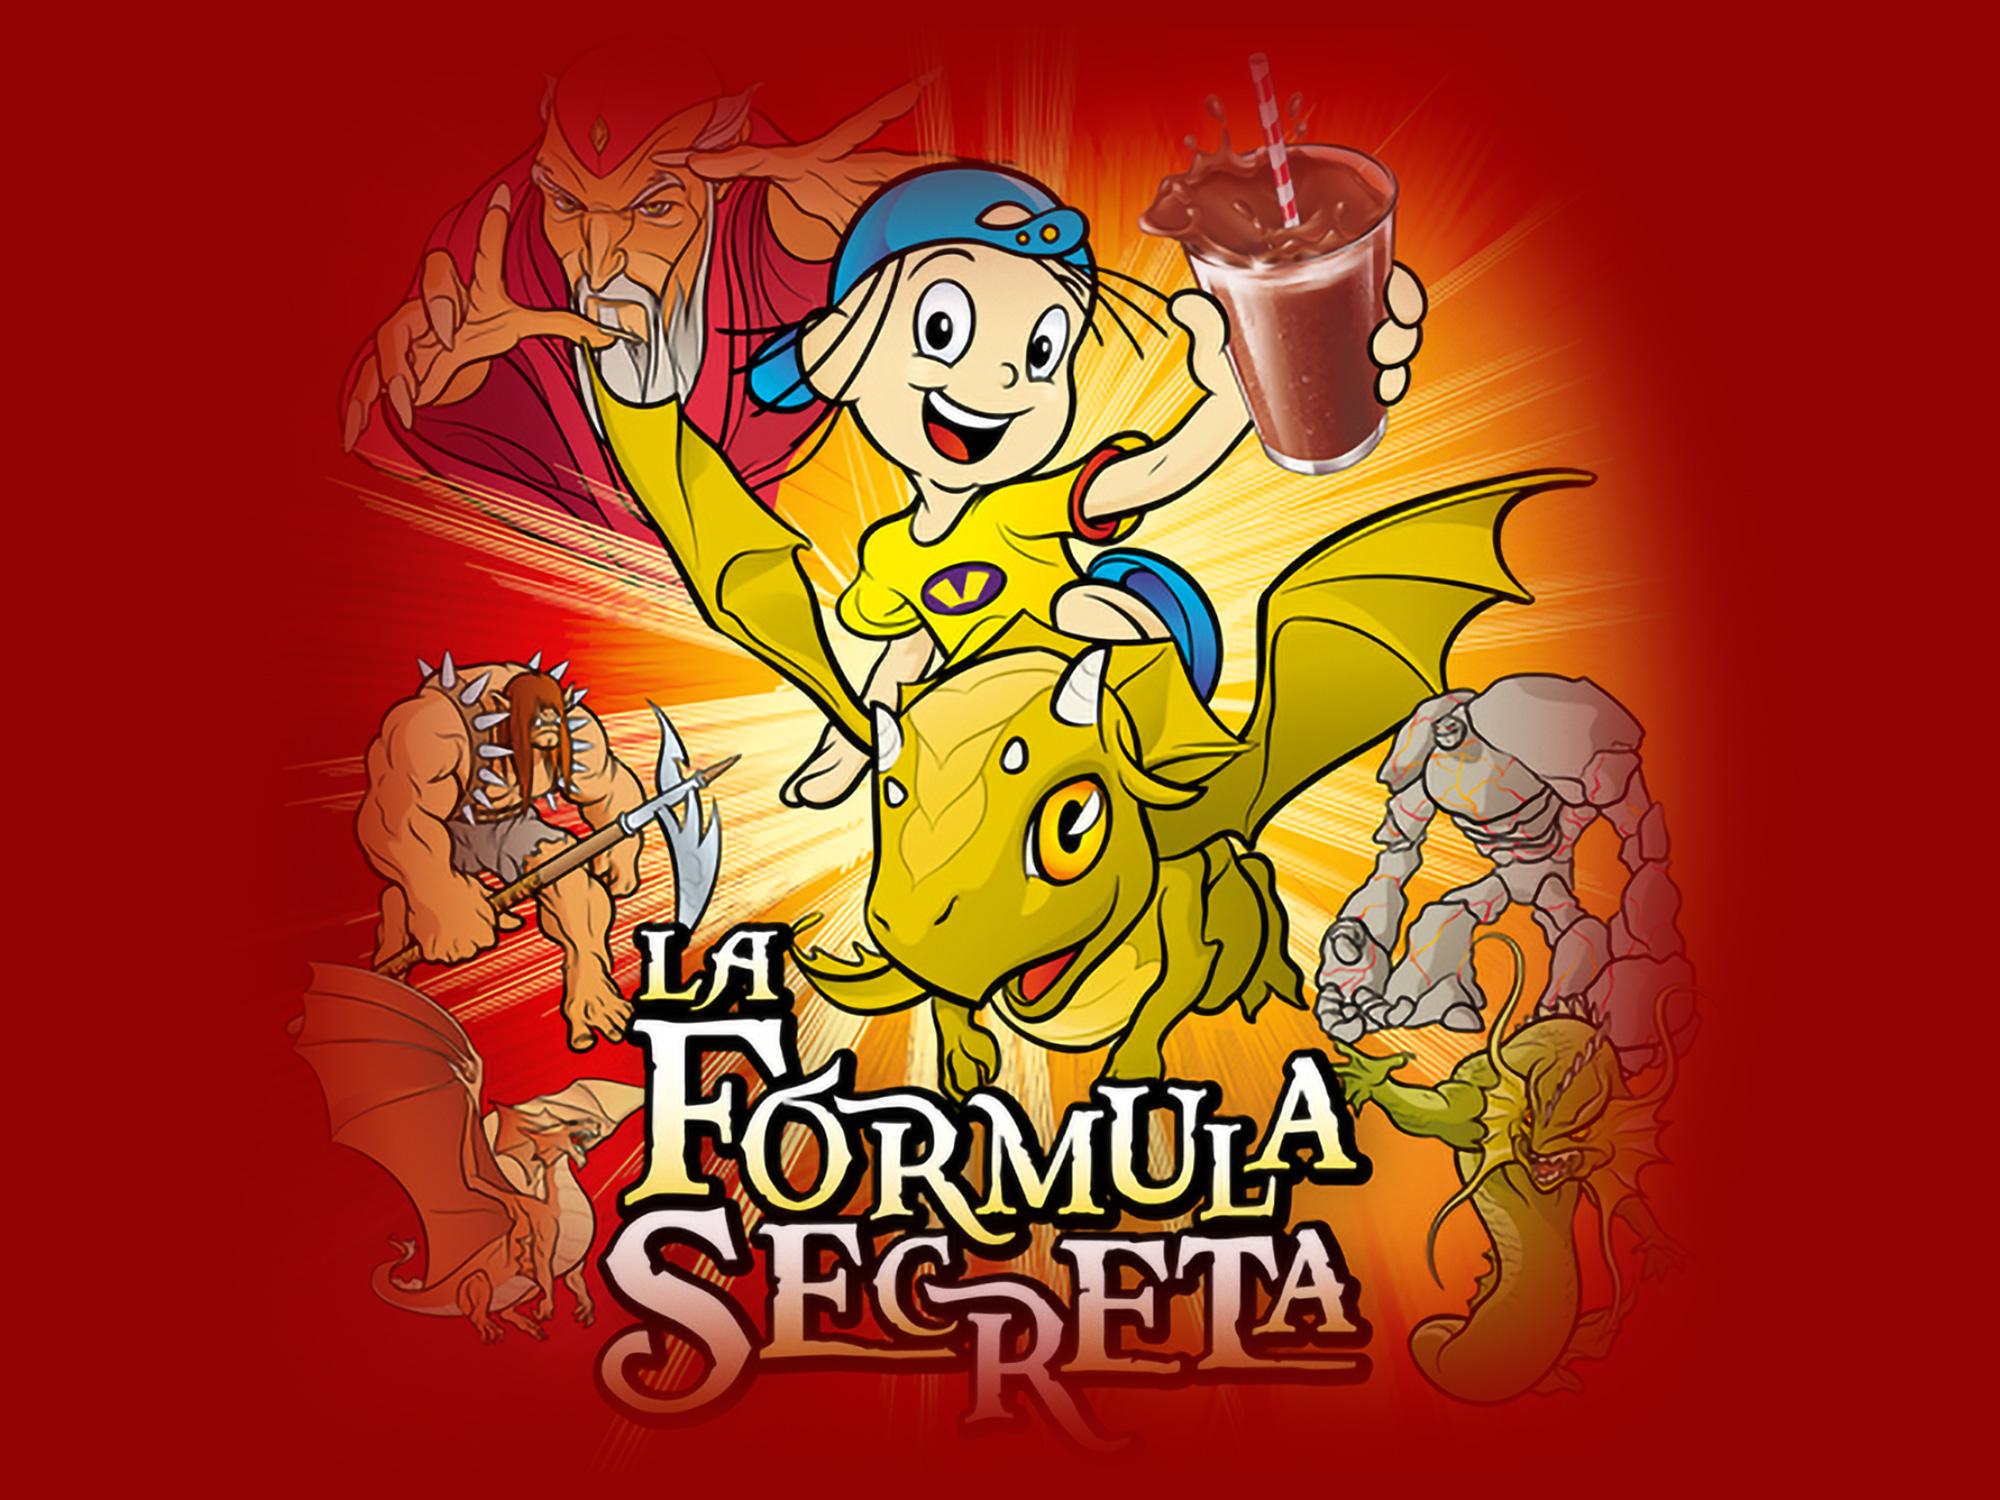 vascolet 2 la formula secreta sitio oficial